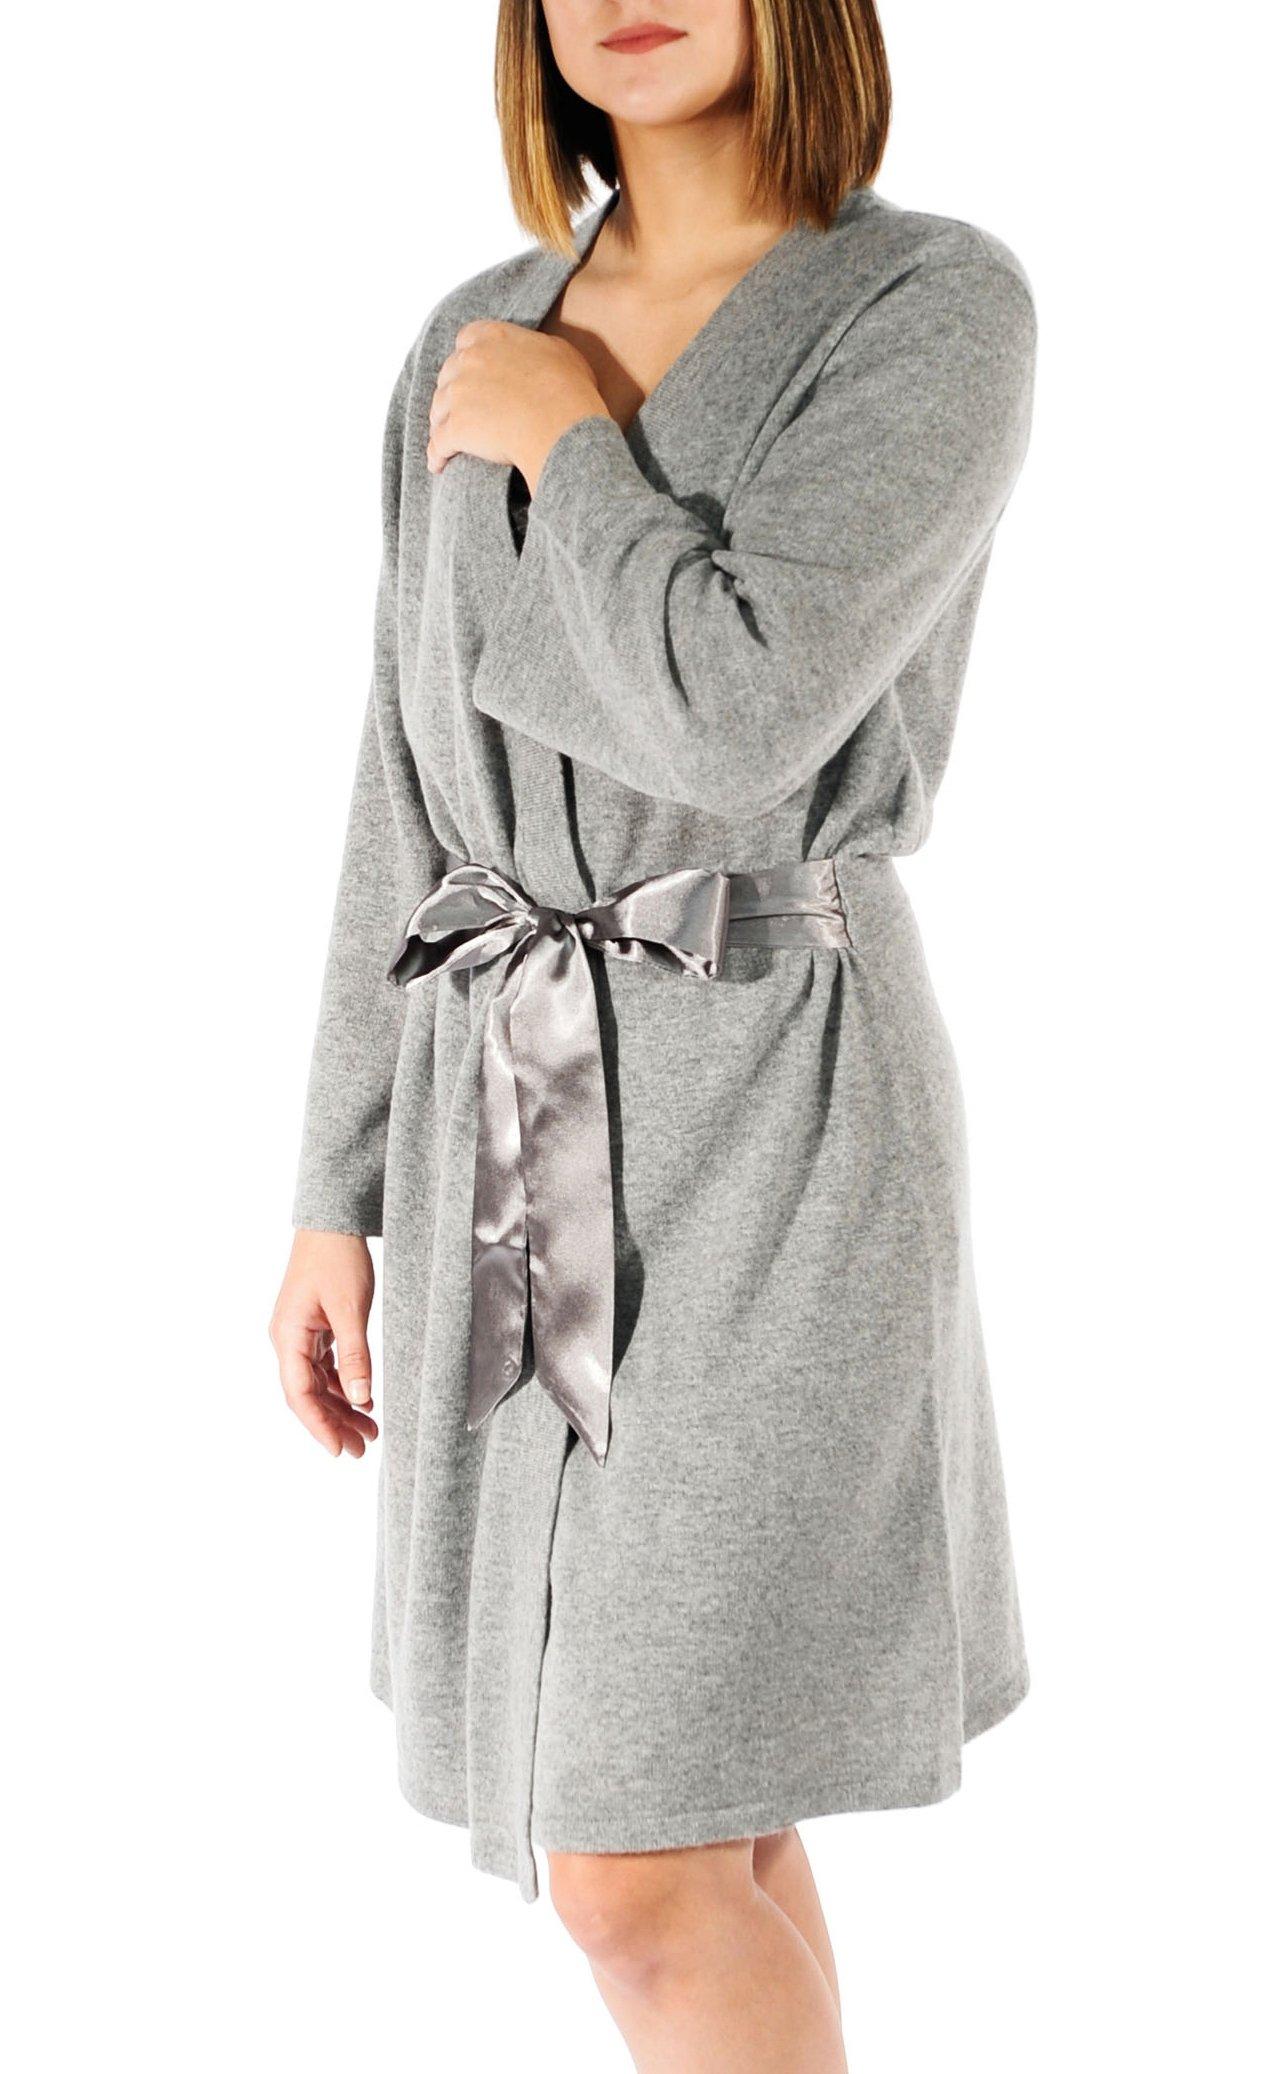 Gigi Reaume 100% Cashmere Women's Robe, Wrap Style, Satin Belt, Short Length (X-Large, Grey Heather)